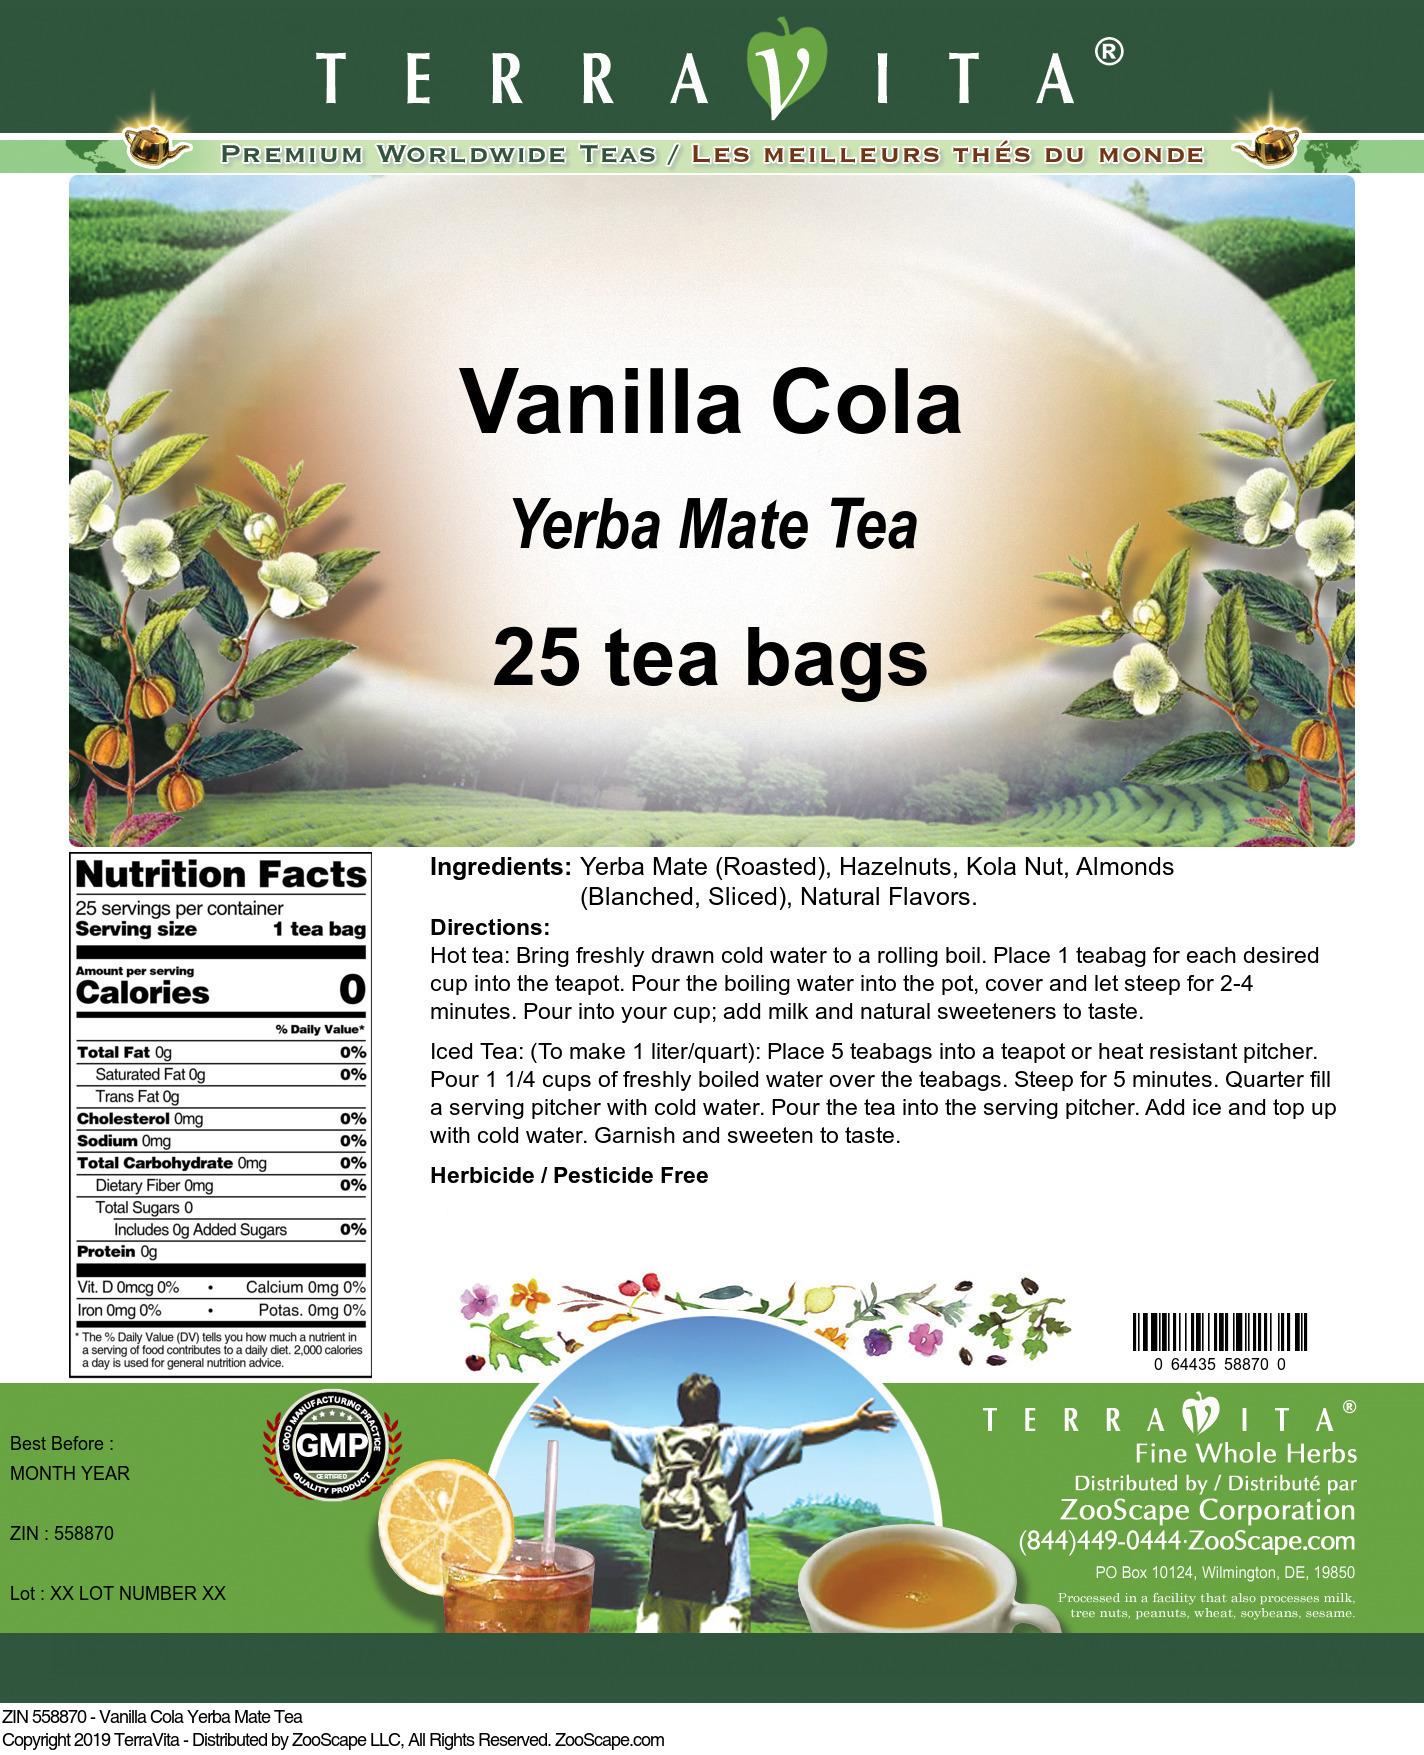 Vanilla Cola Yerba Mate Tea